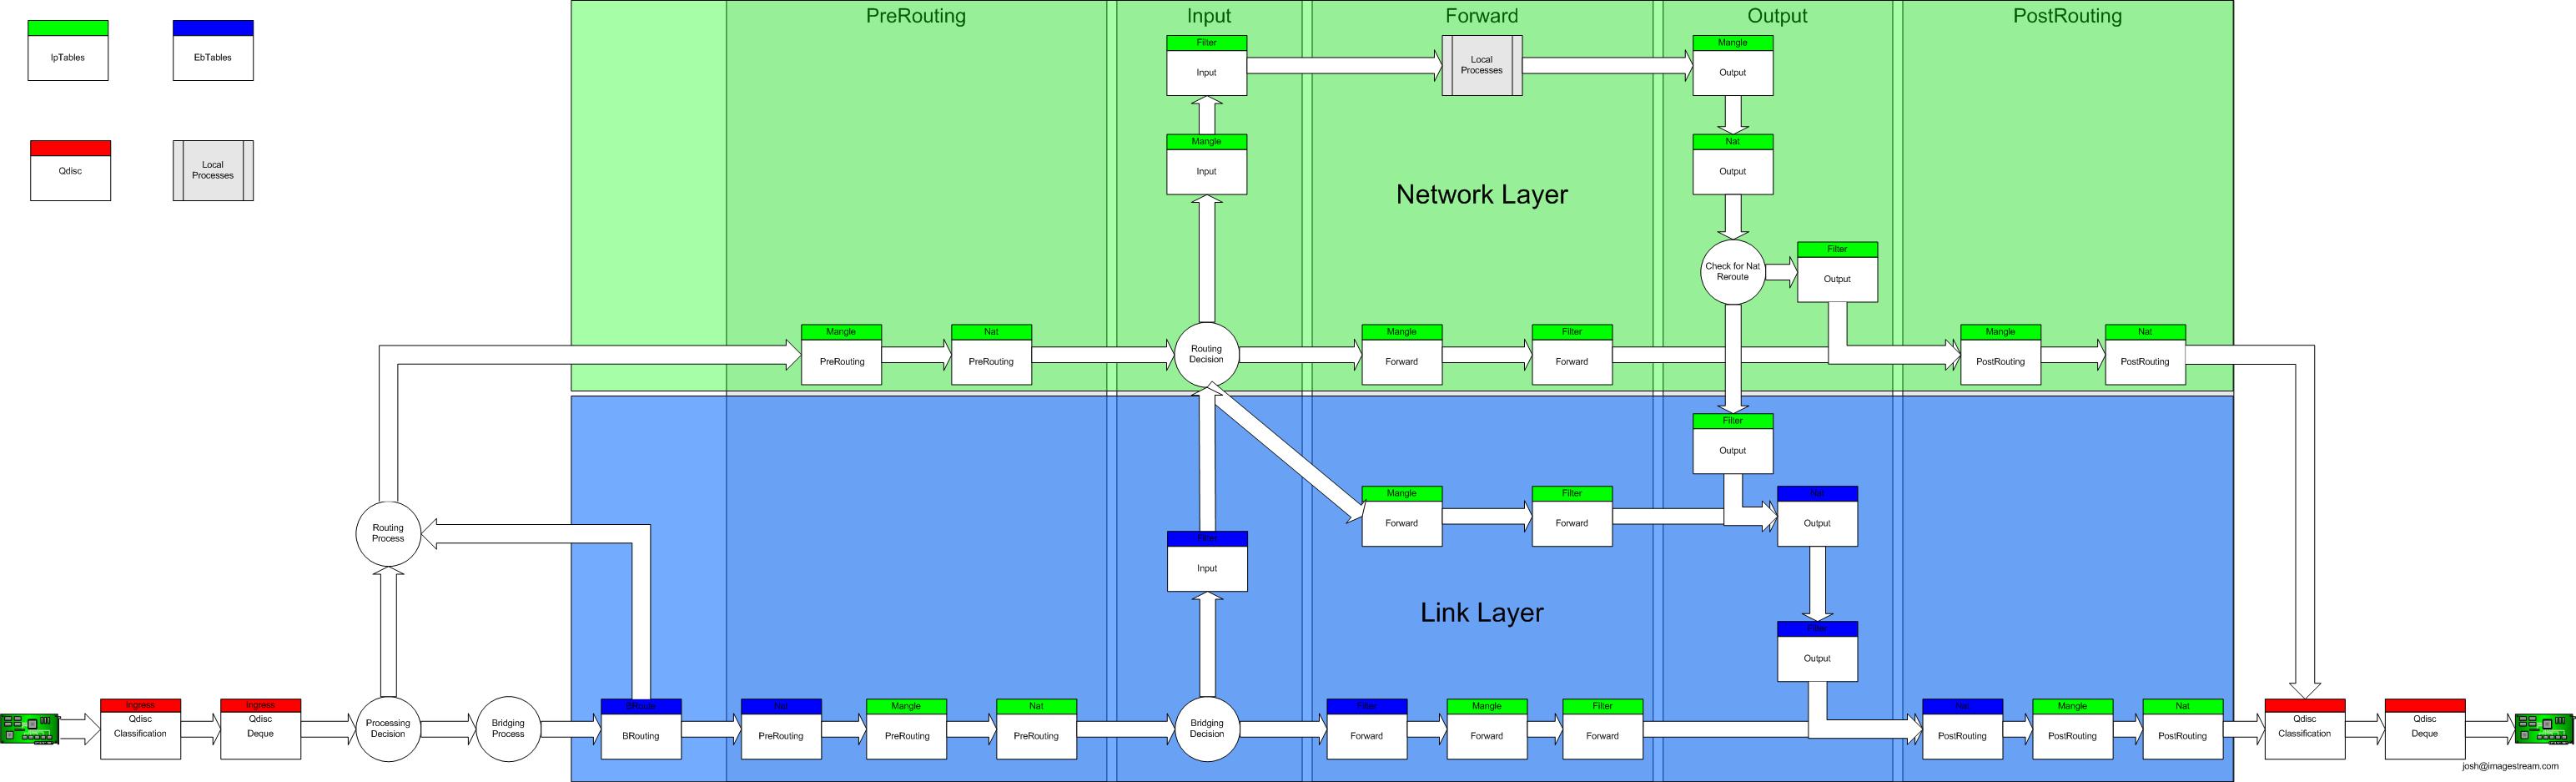 Linux 系统的内置防火墙功能 - widebright - widebright的个人空间